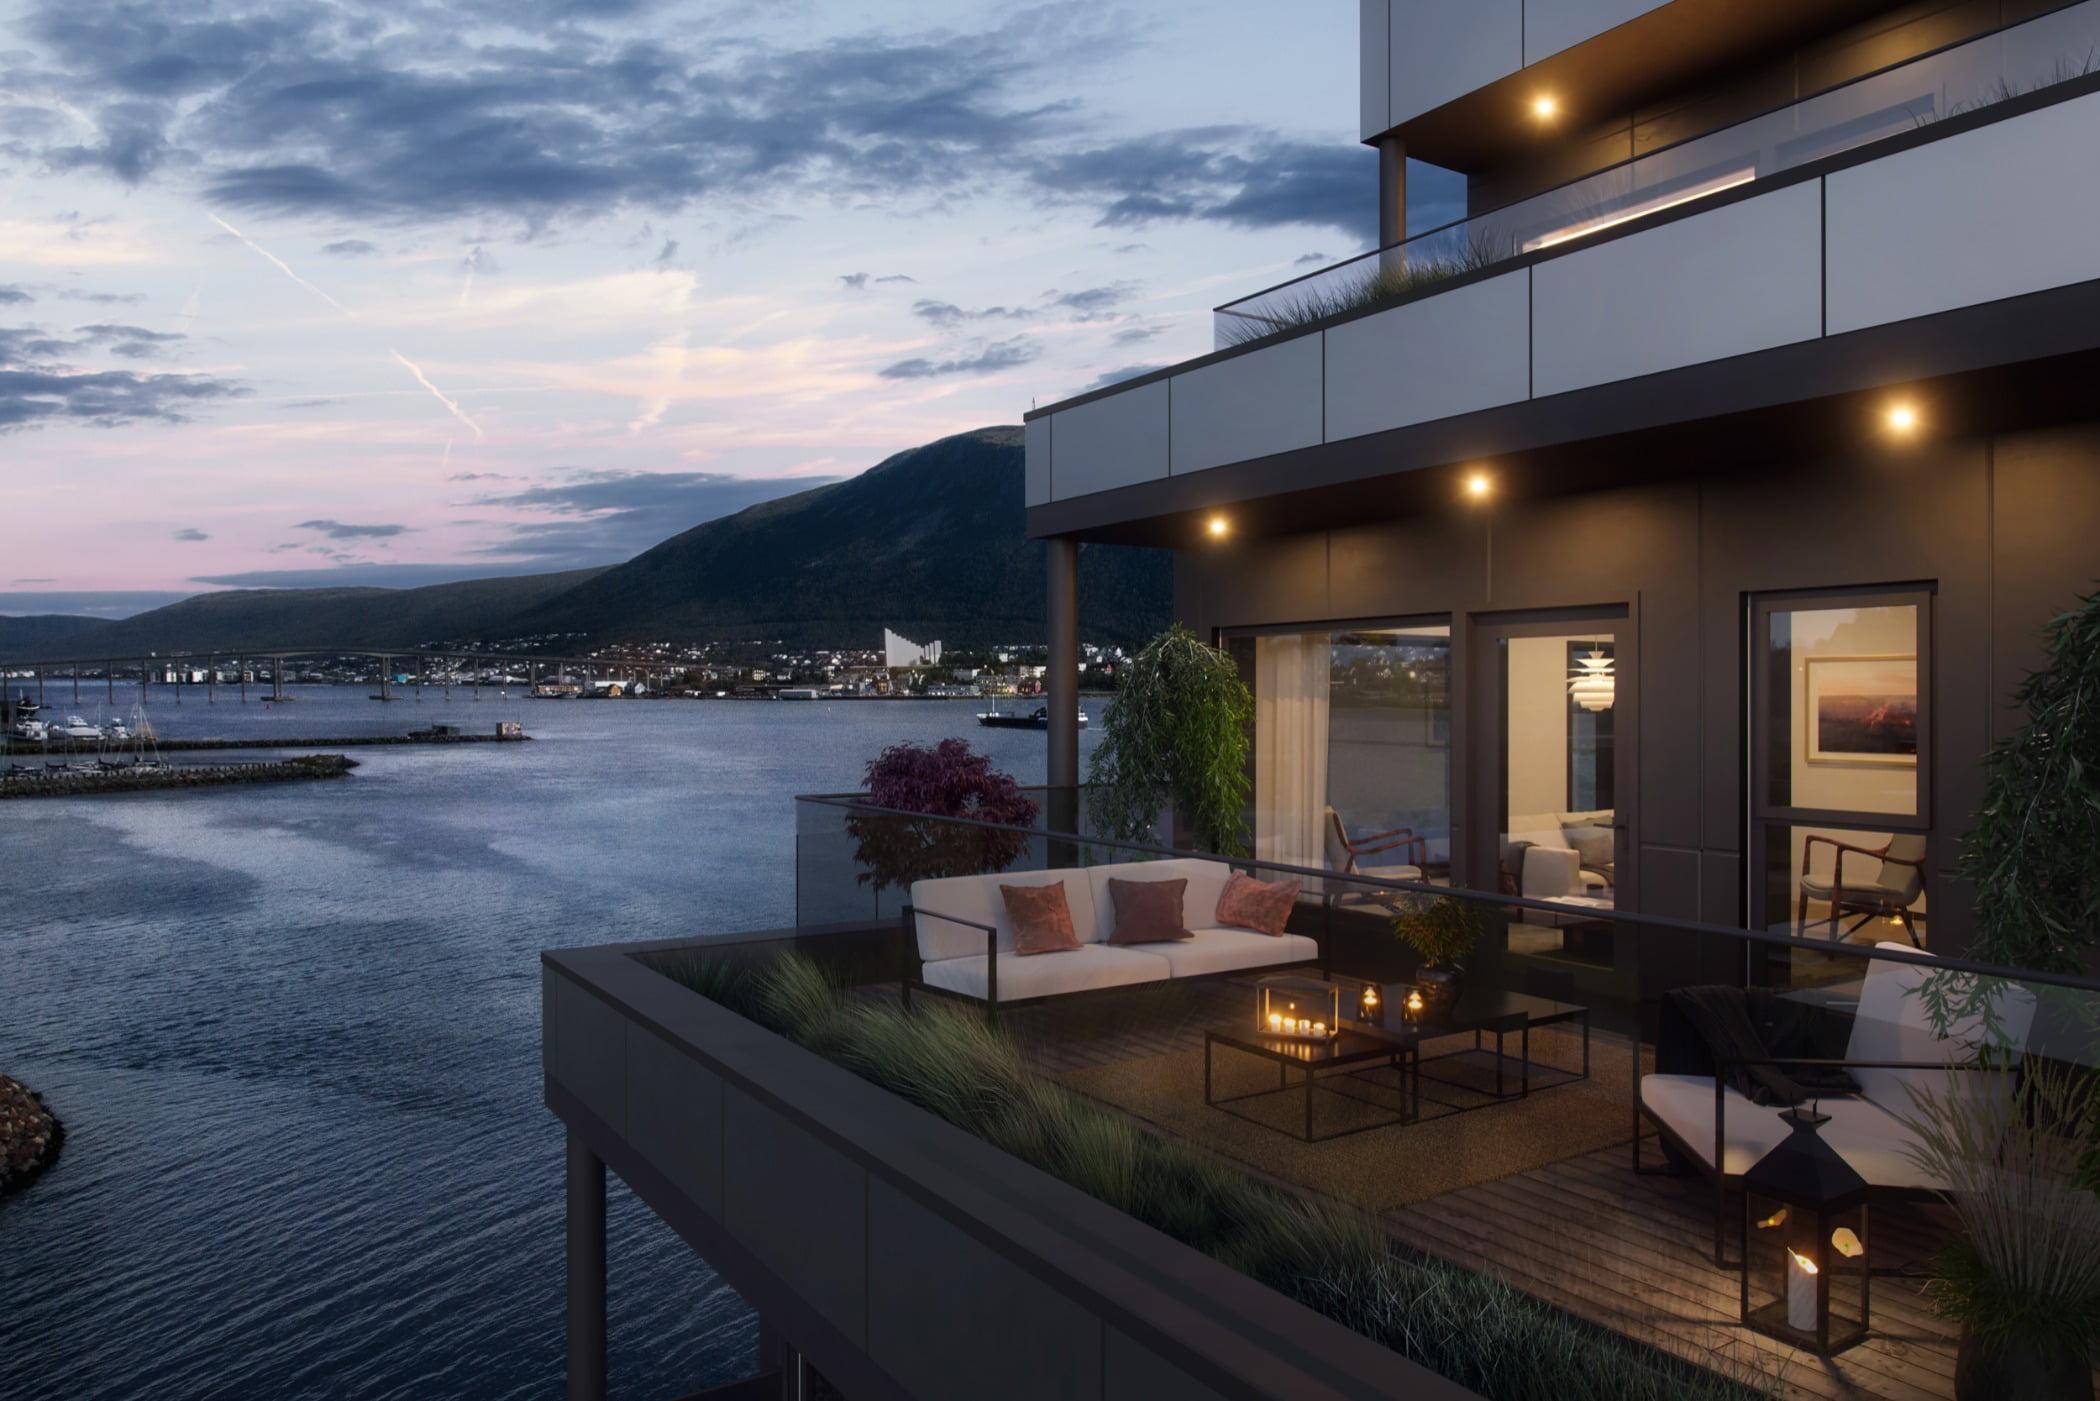 Interior design, Cloud, Sky, Building, Property, Plant, Window, Houseplant, Water, Flowerpot